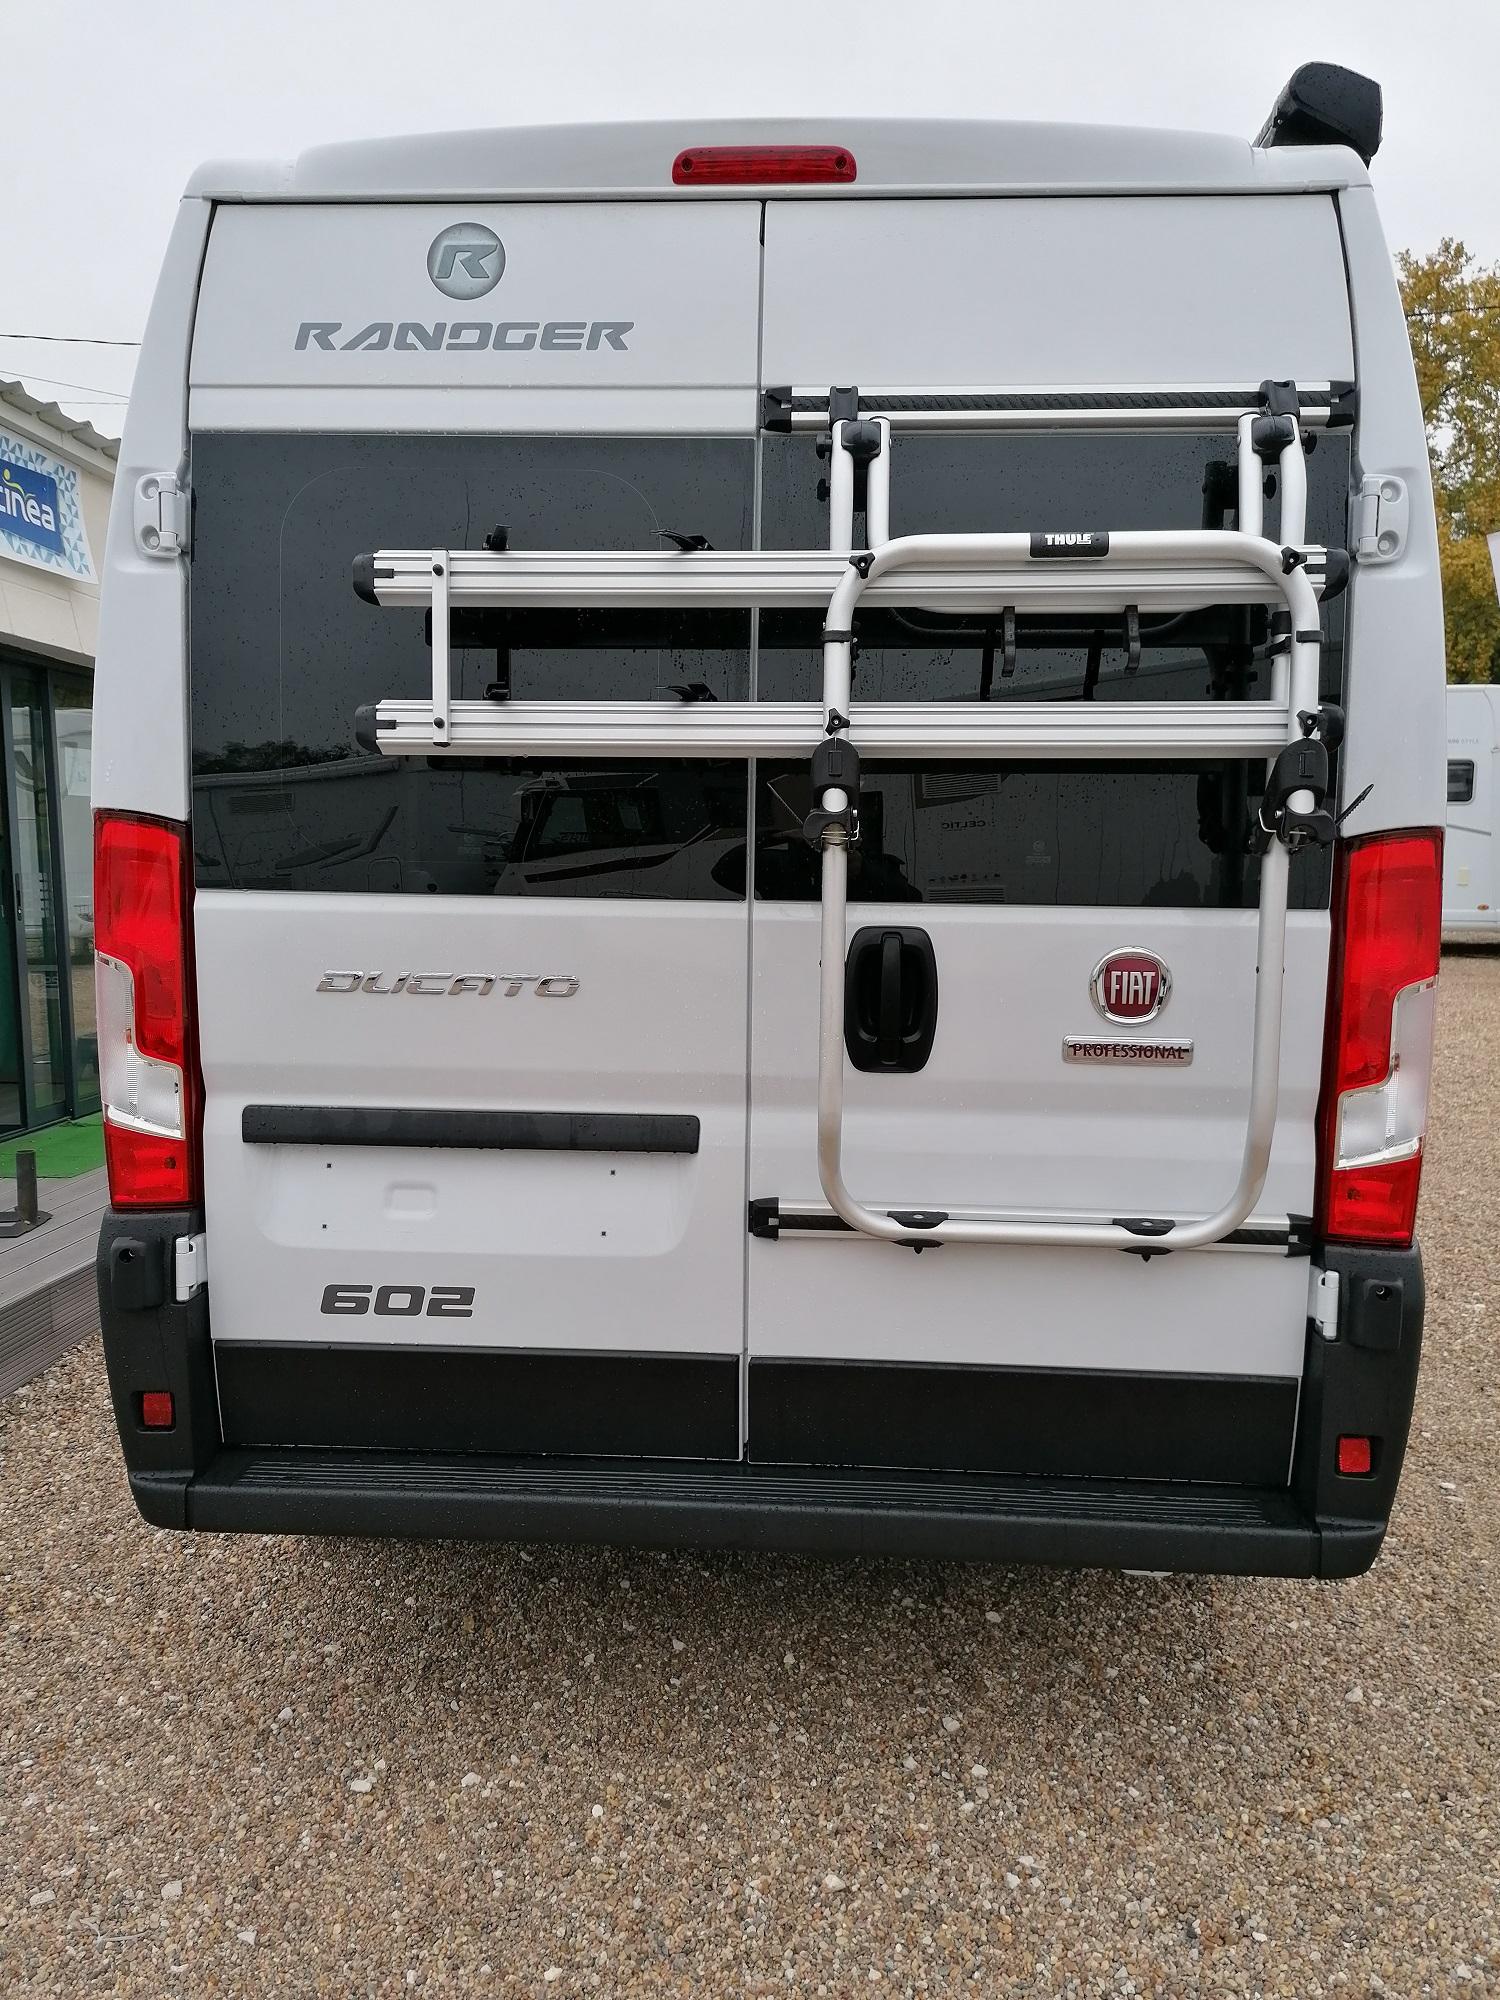 Randger R 602